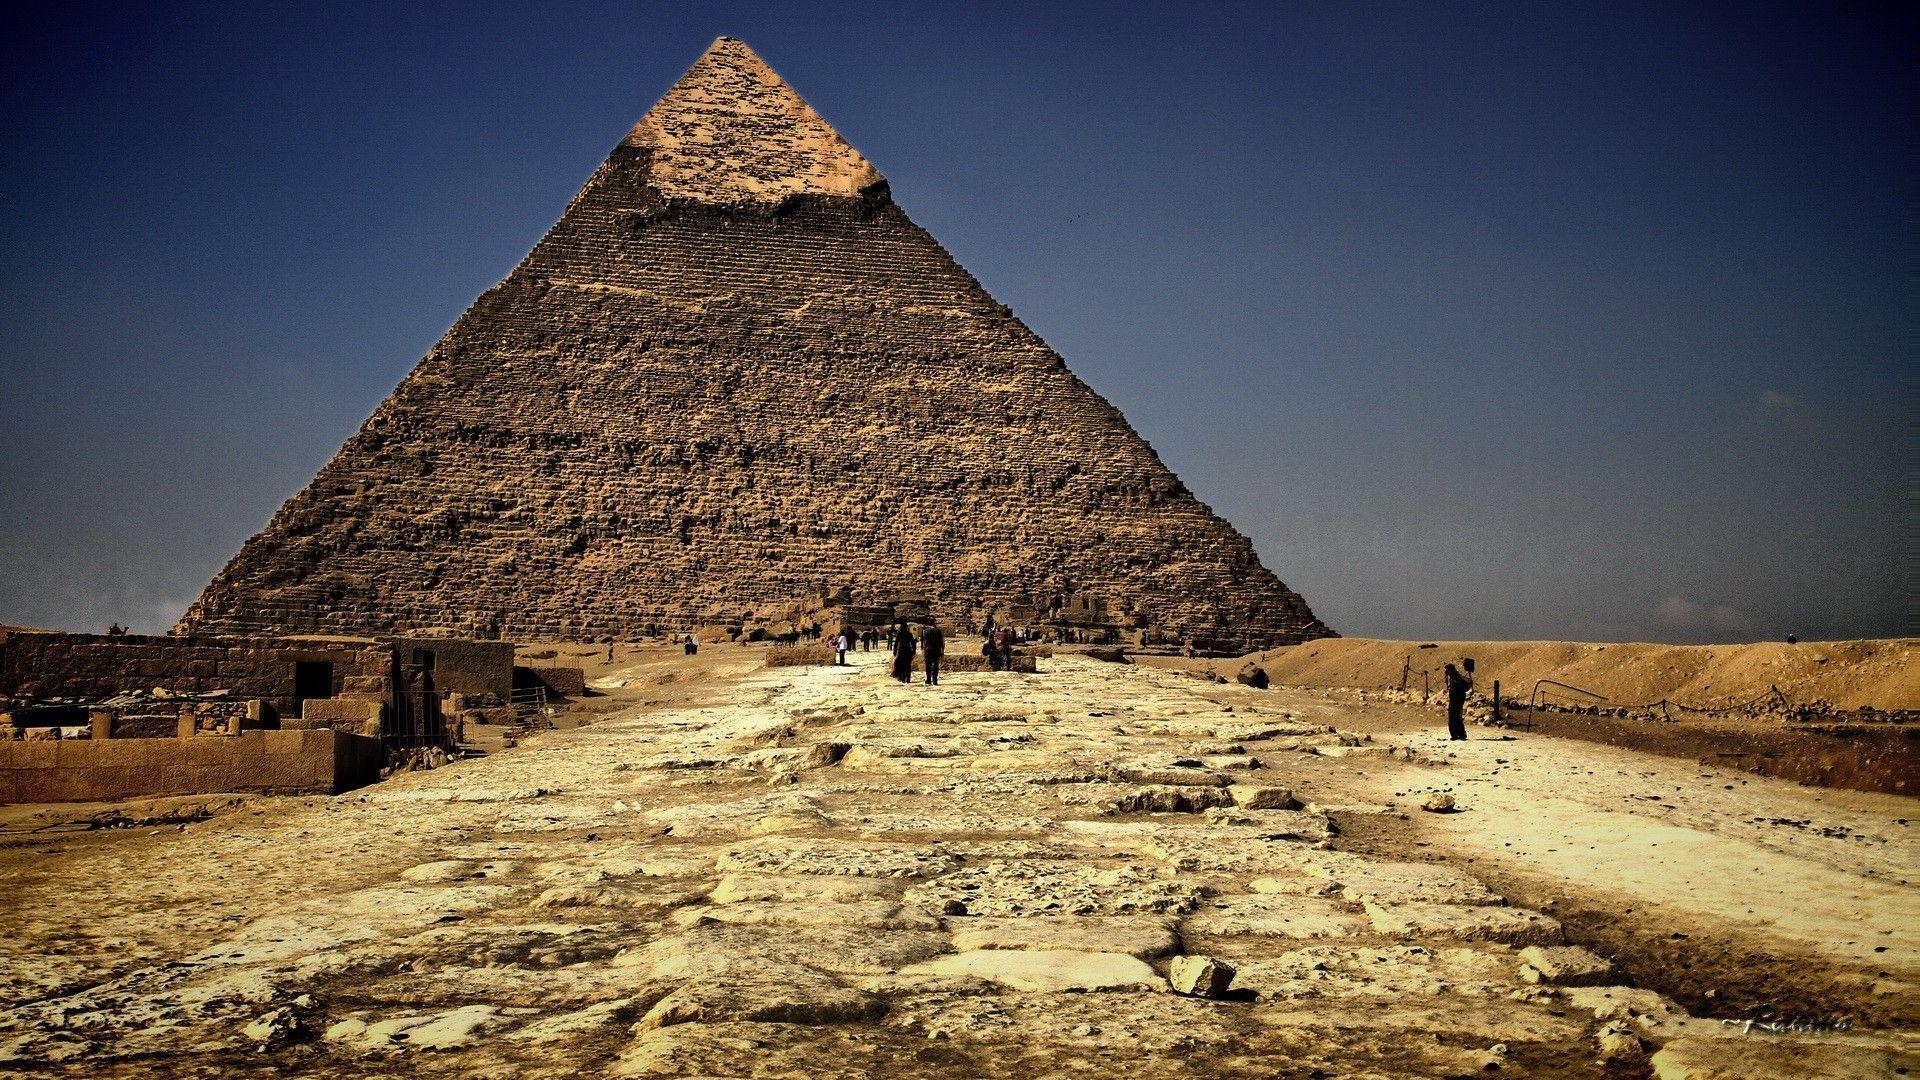 Download 1920x1080 Hd Wallpaper Pyramid Travel Attractions Ancient Egypt Desert Wonder Desktop Backgrou Great Pyramid Of Giza Pyramids Of Giza Egypt Wallpaper